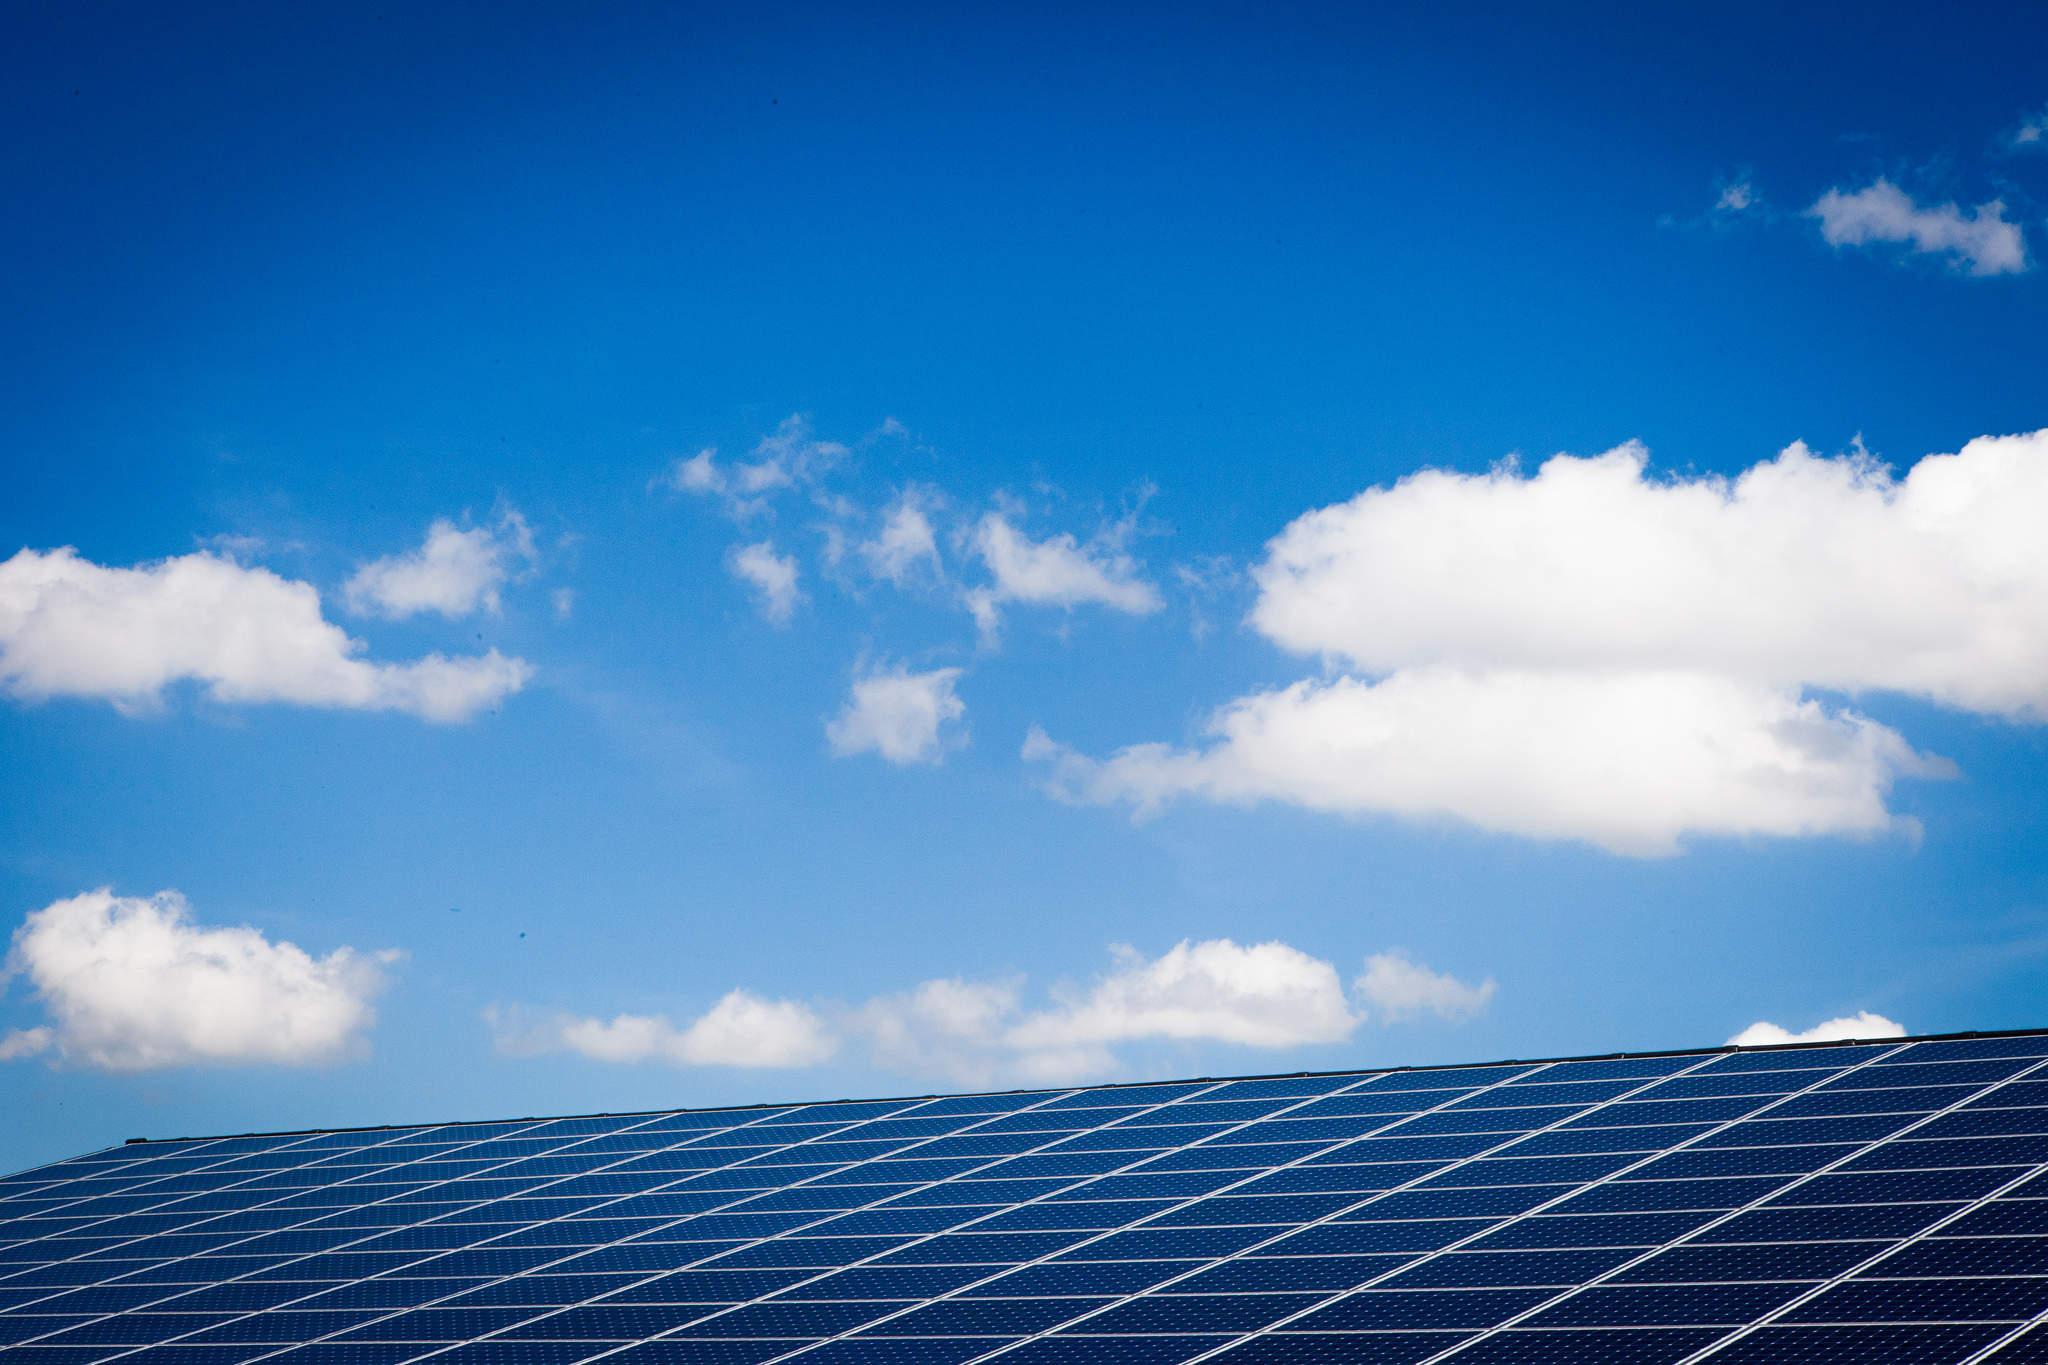 Image 2-Garland solar facility